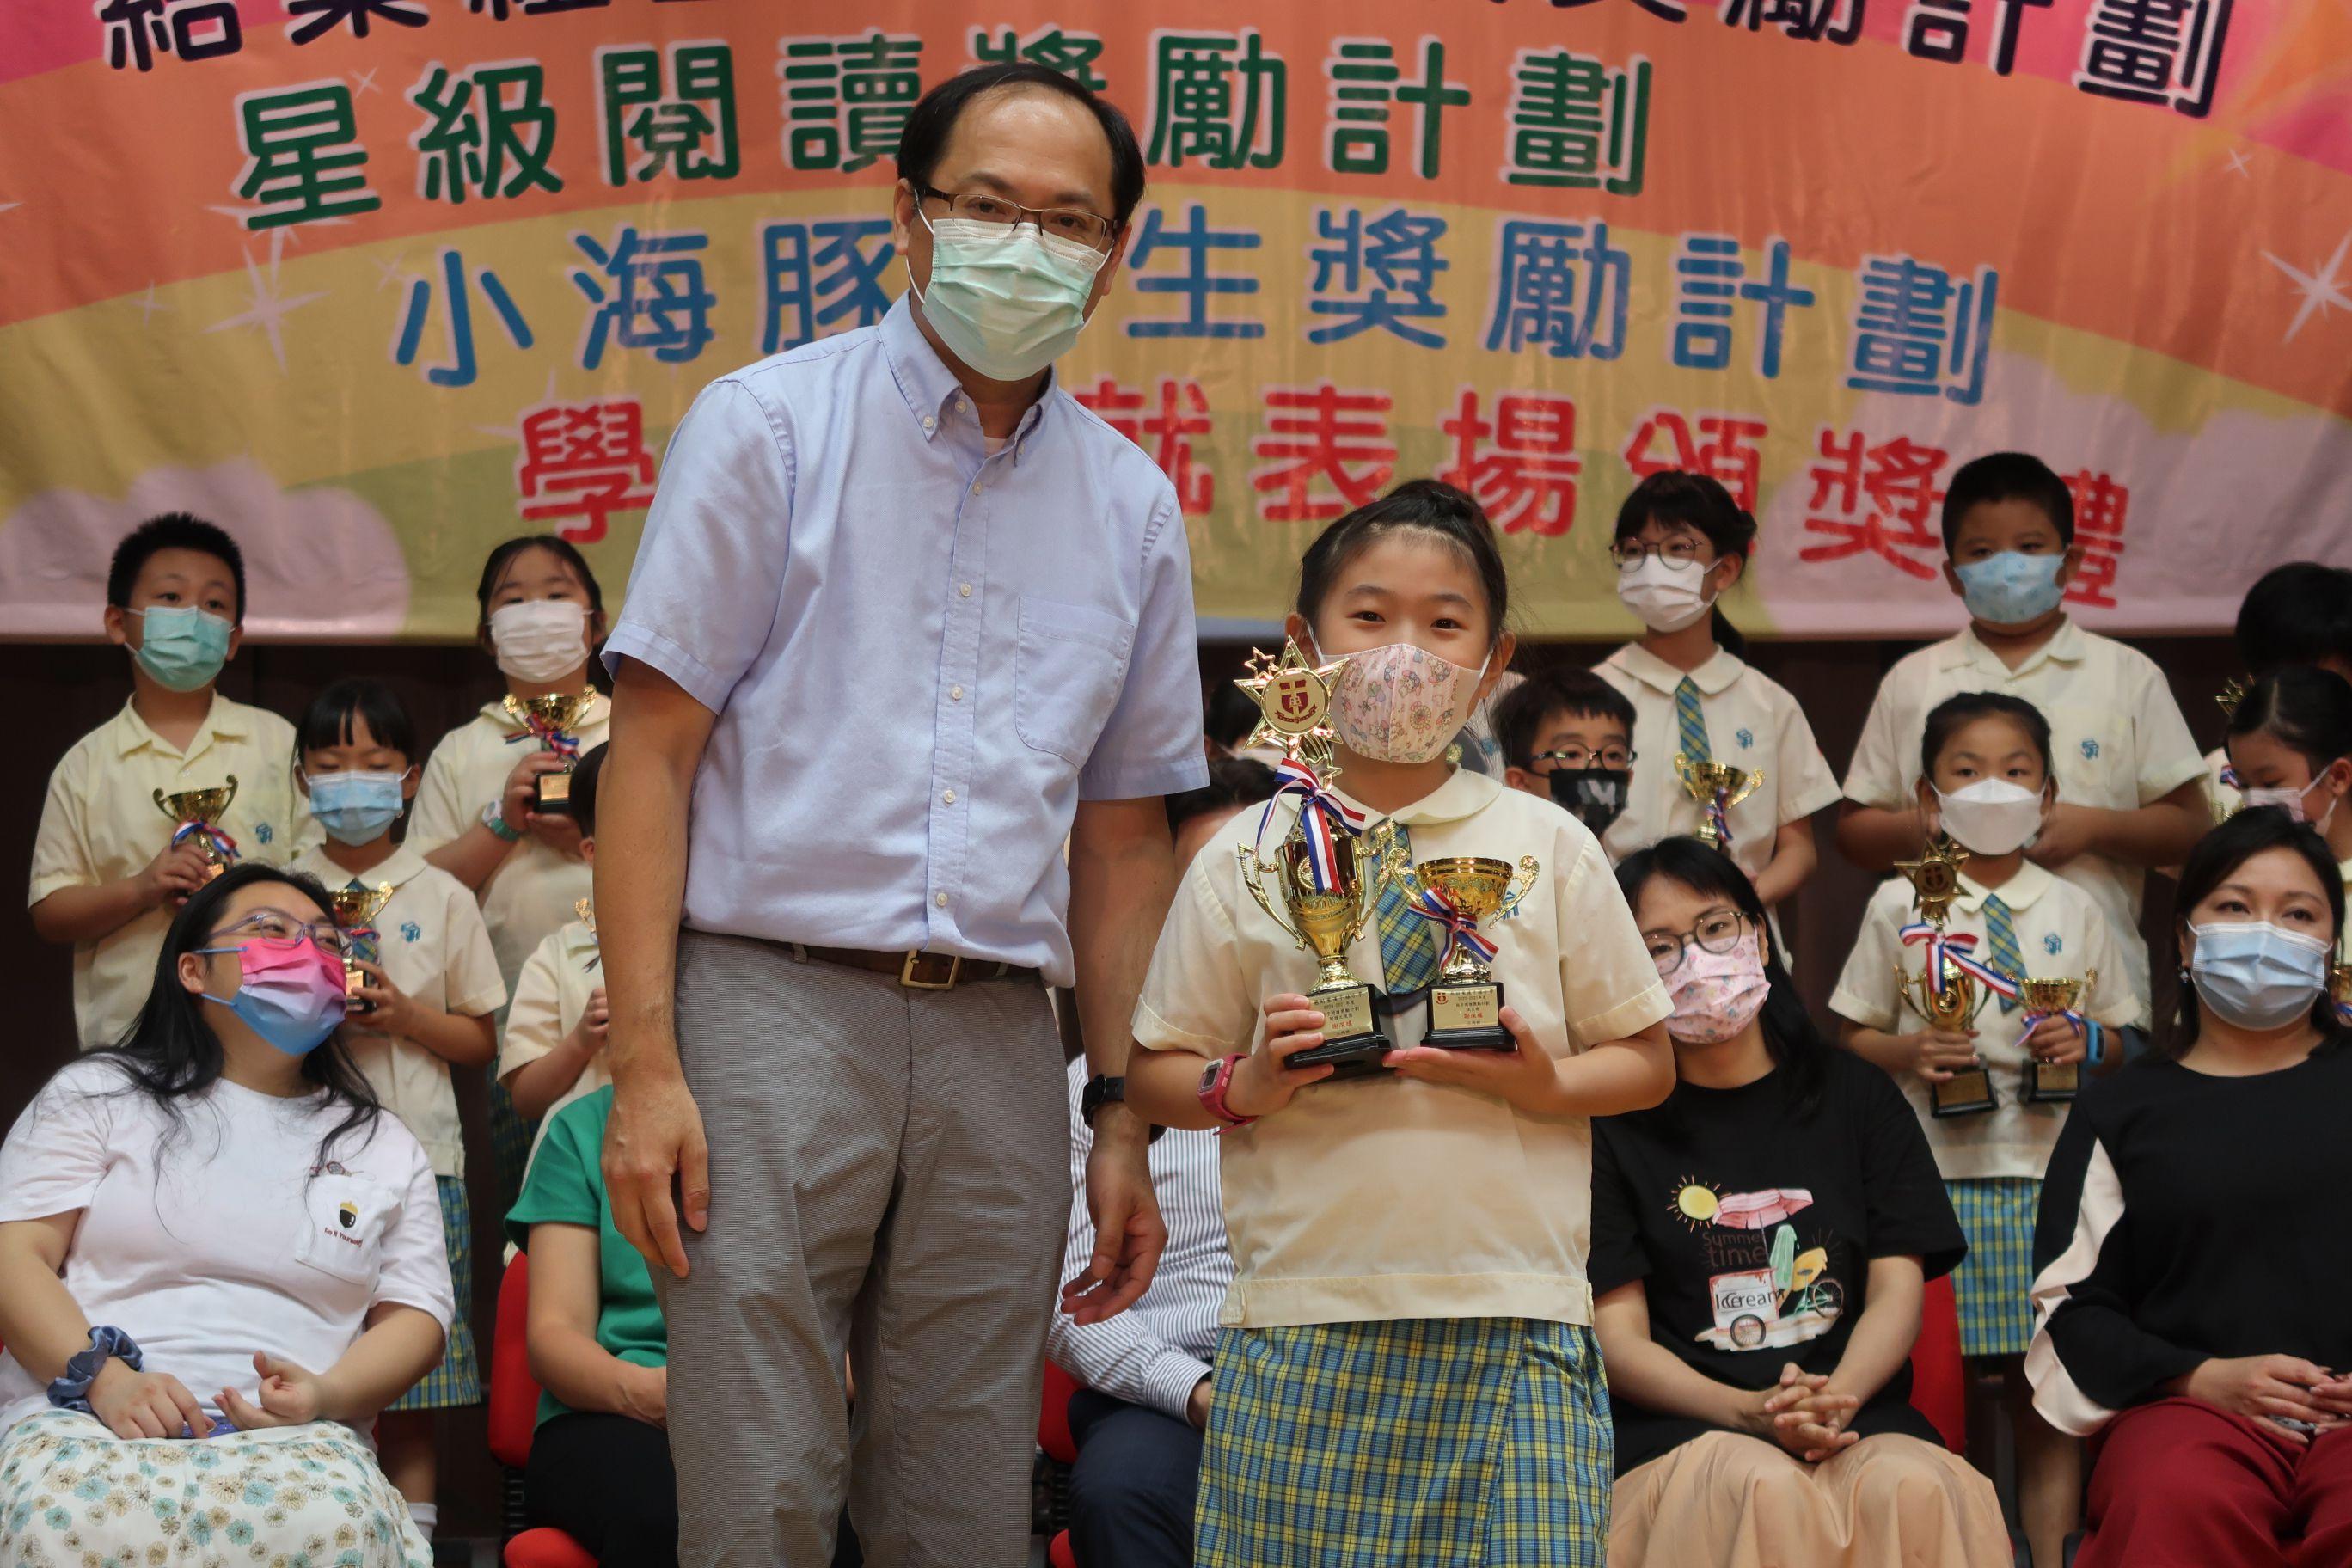 https://syh.edu.hk/sites/default/files/img_5875.jpg